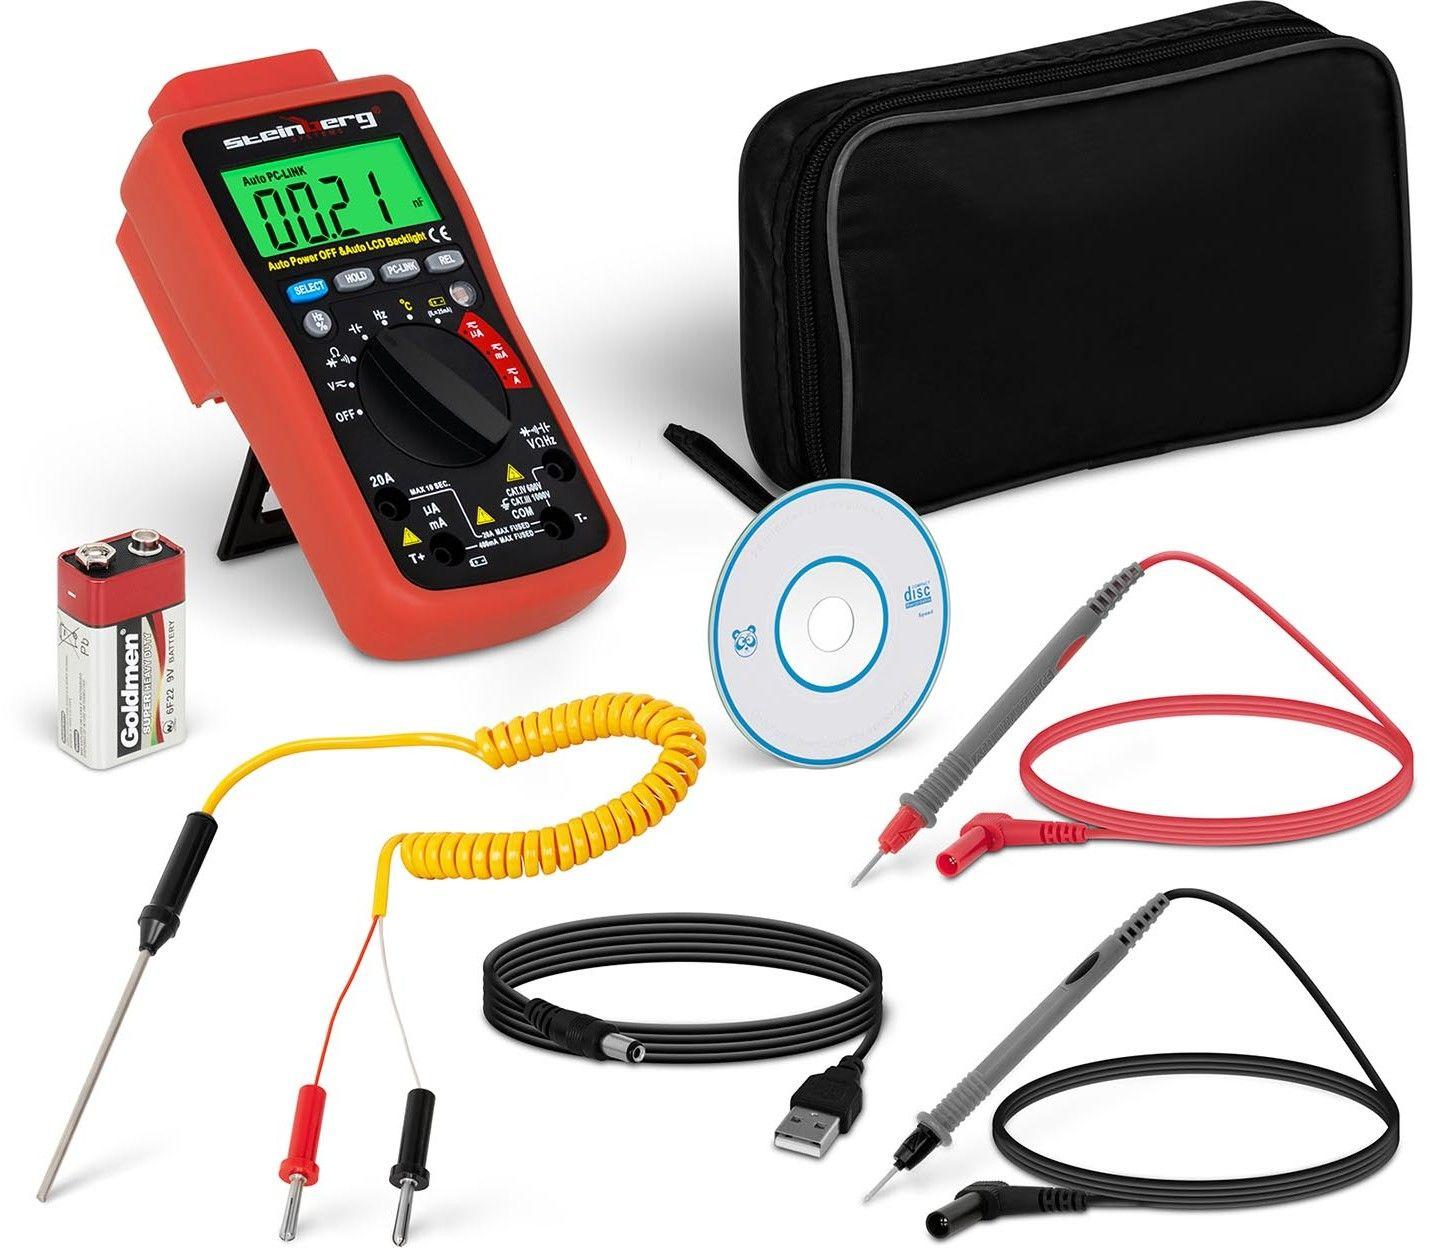 Multimetr cyfrowy - tester baterii - Steinberg Systems - SBS-DM-1000USB - 3 lata gwarancji/wysyłka w 24h